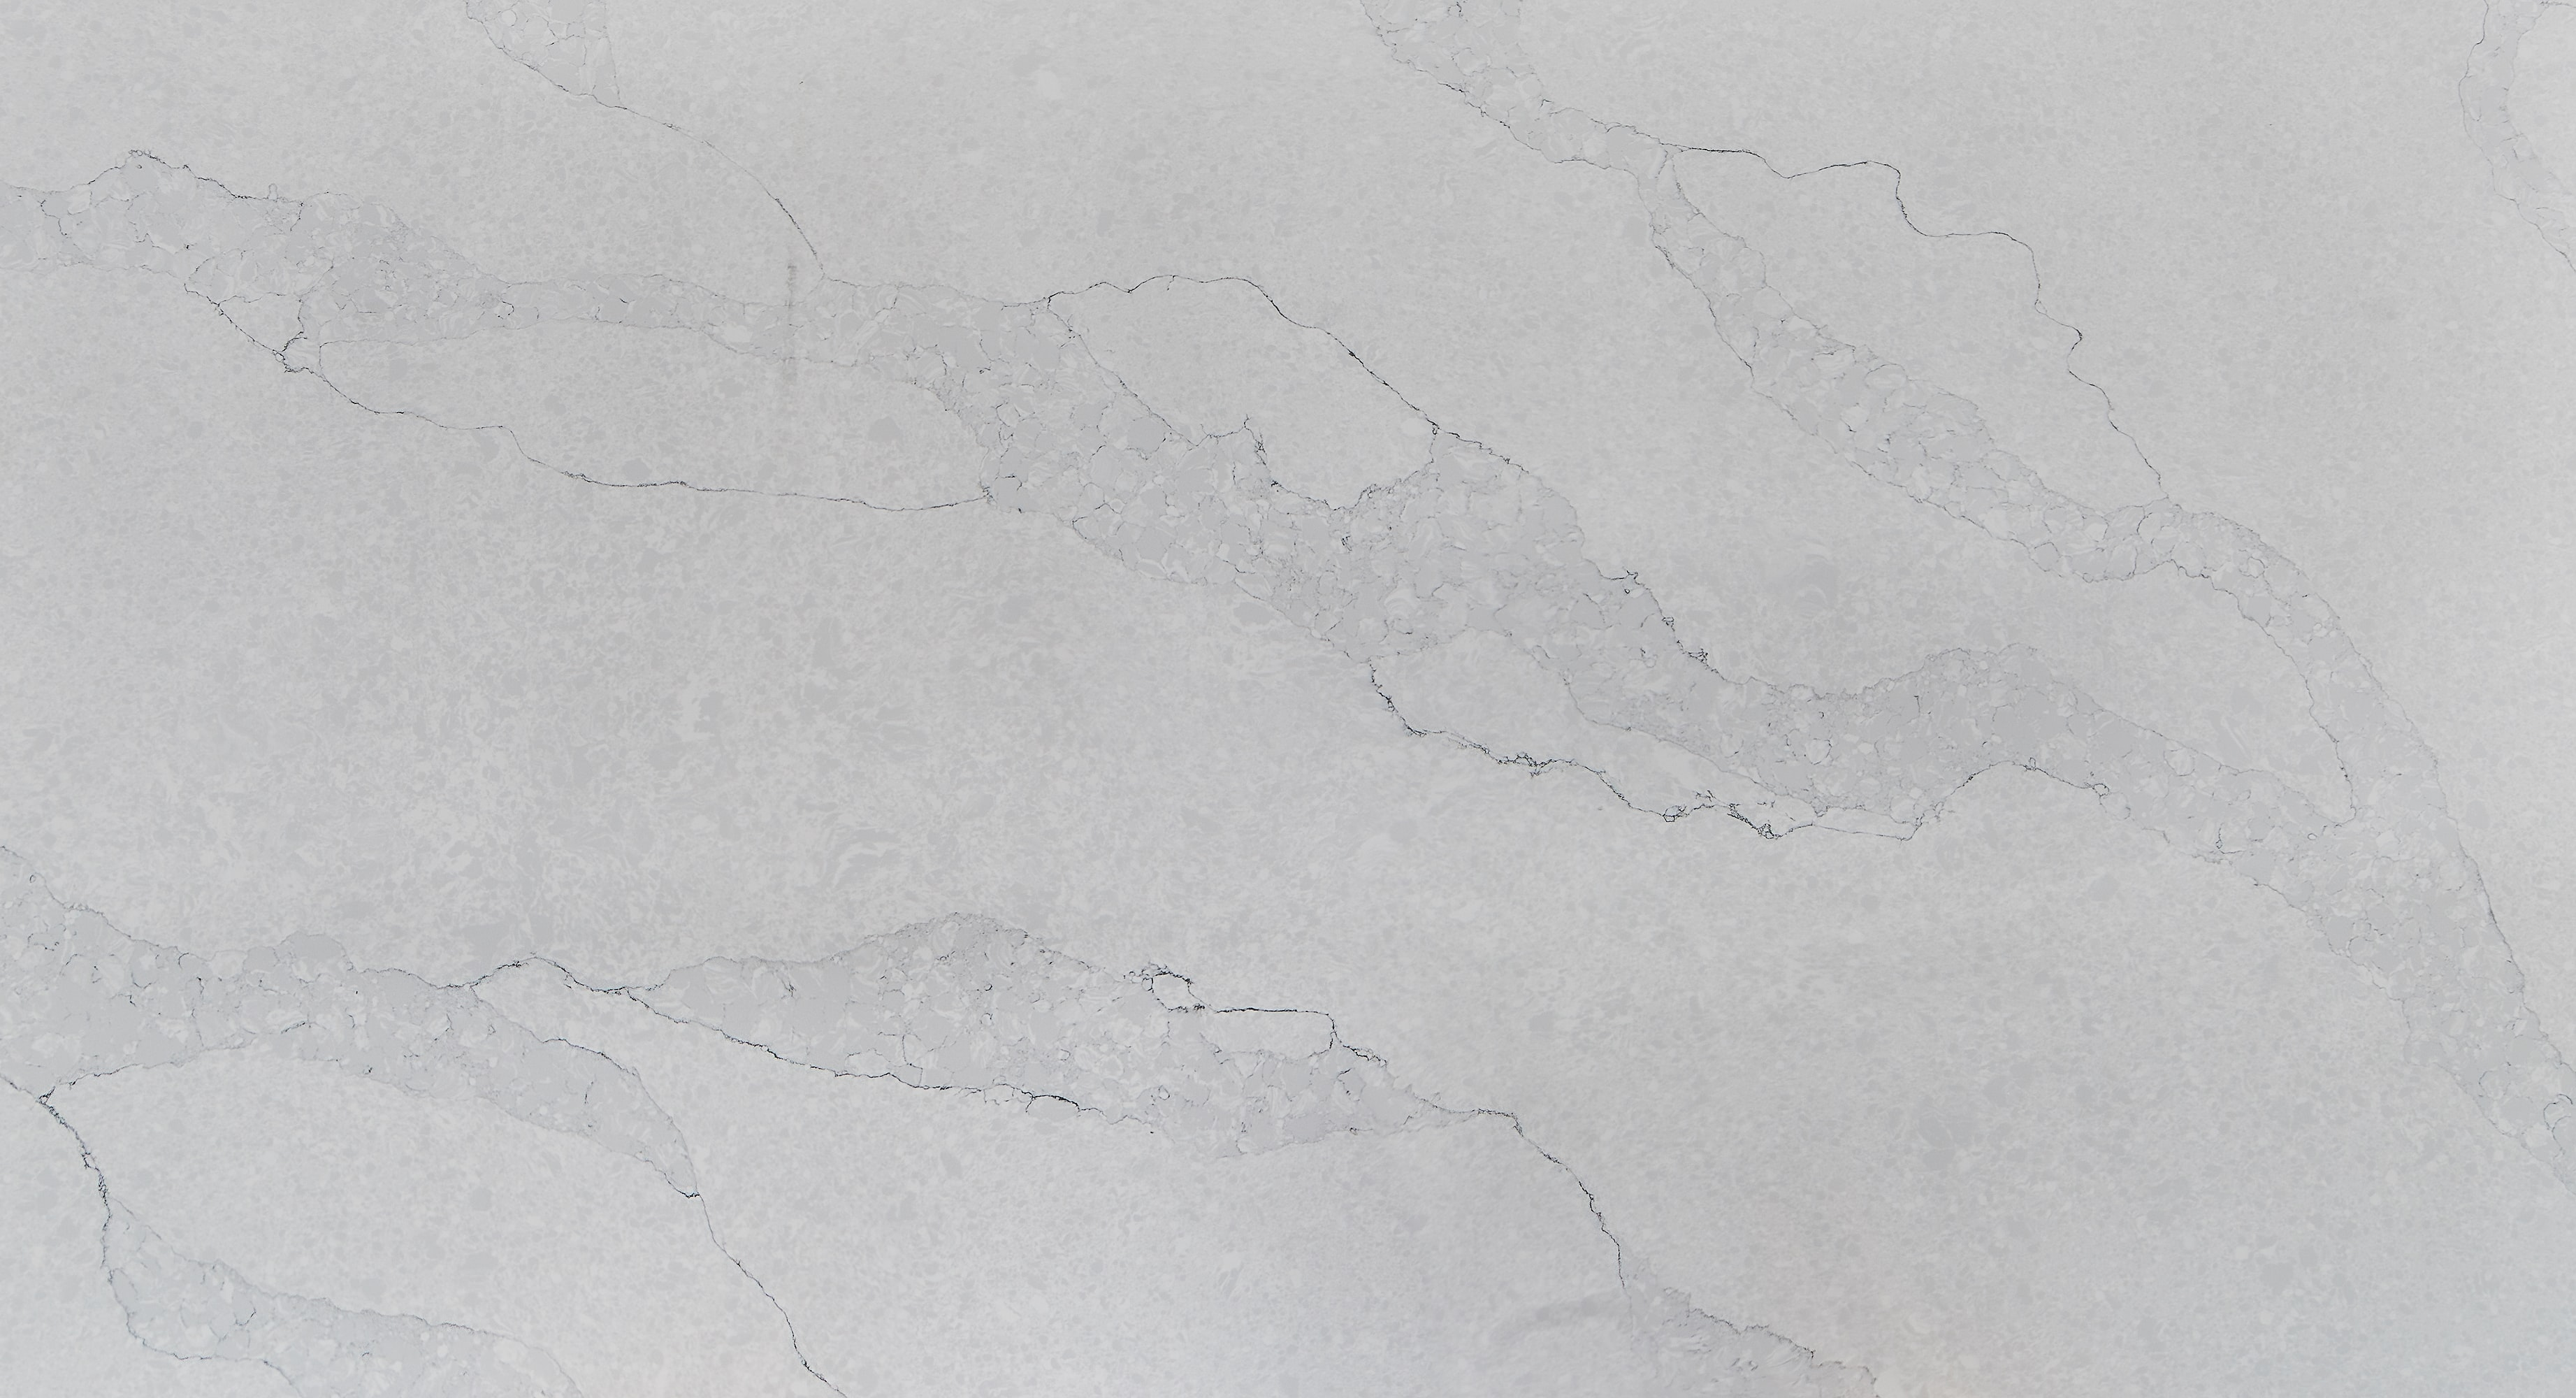 An image of a quartz countertop.